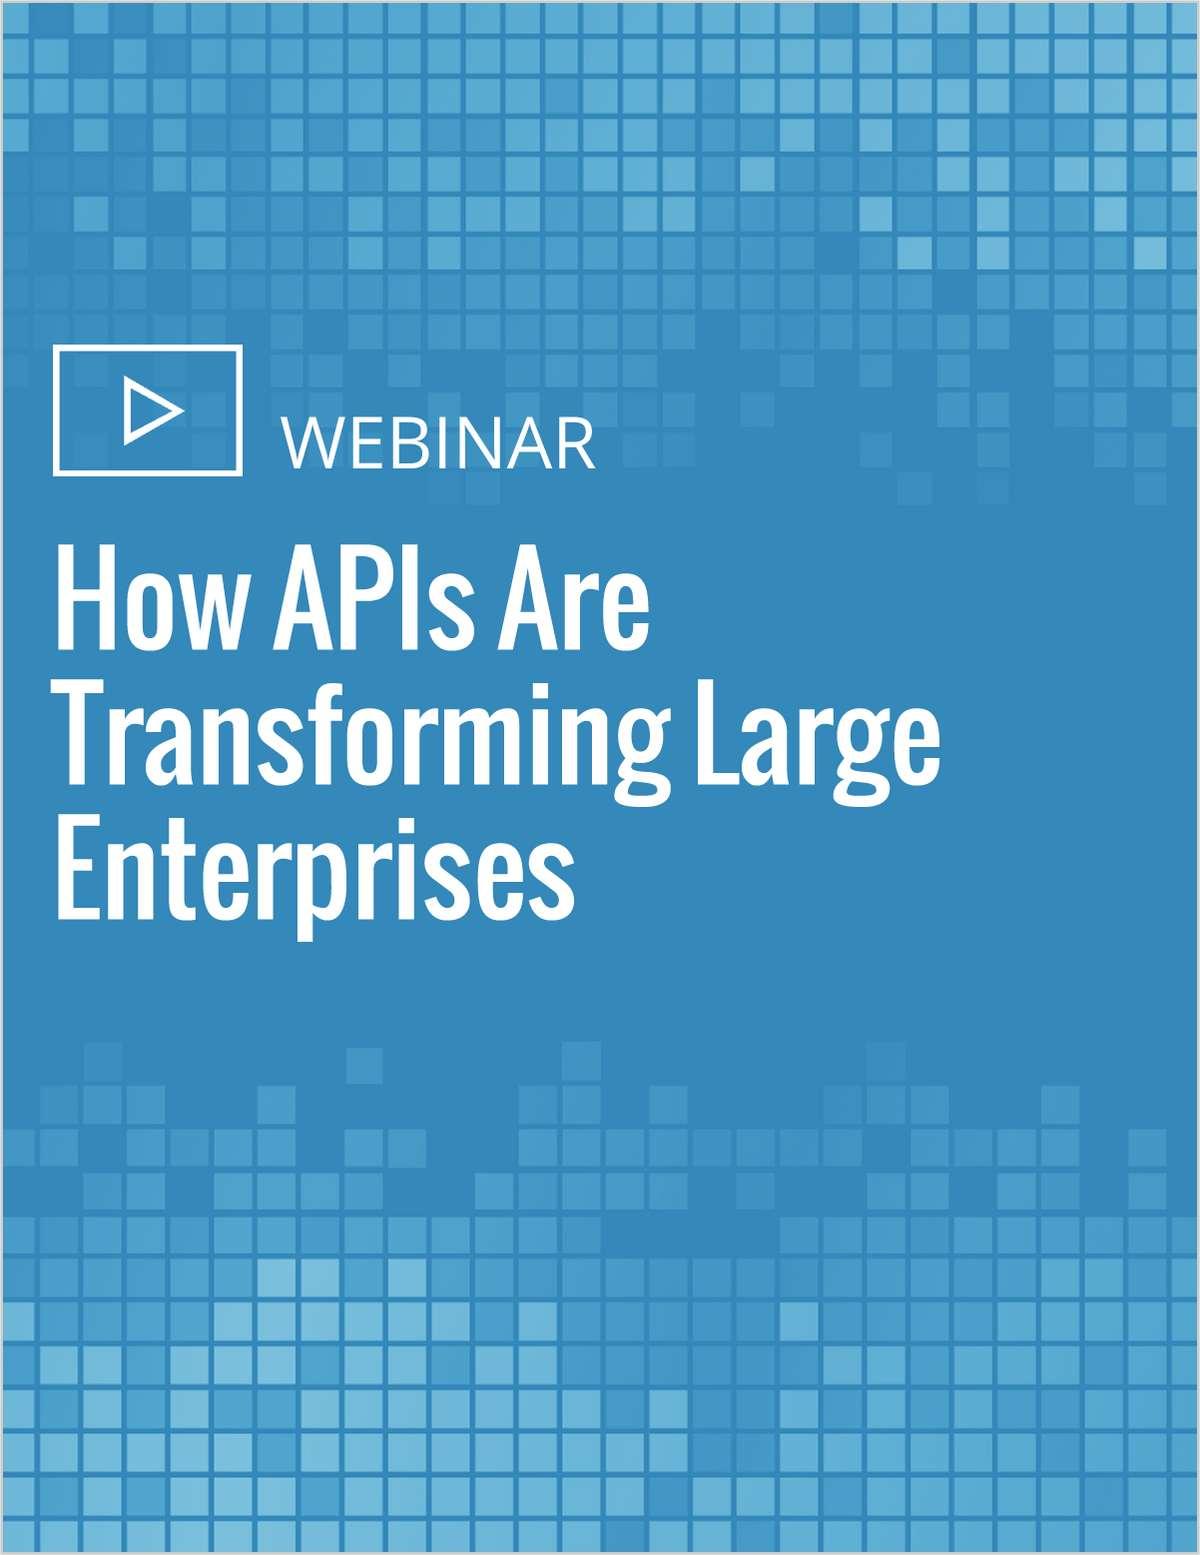 How APIs Are Transforming Large Enterprises